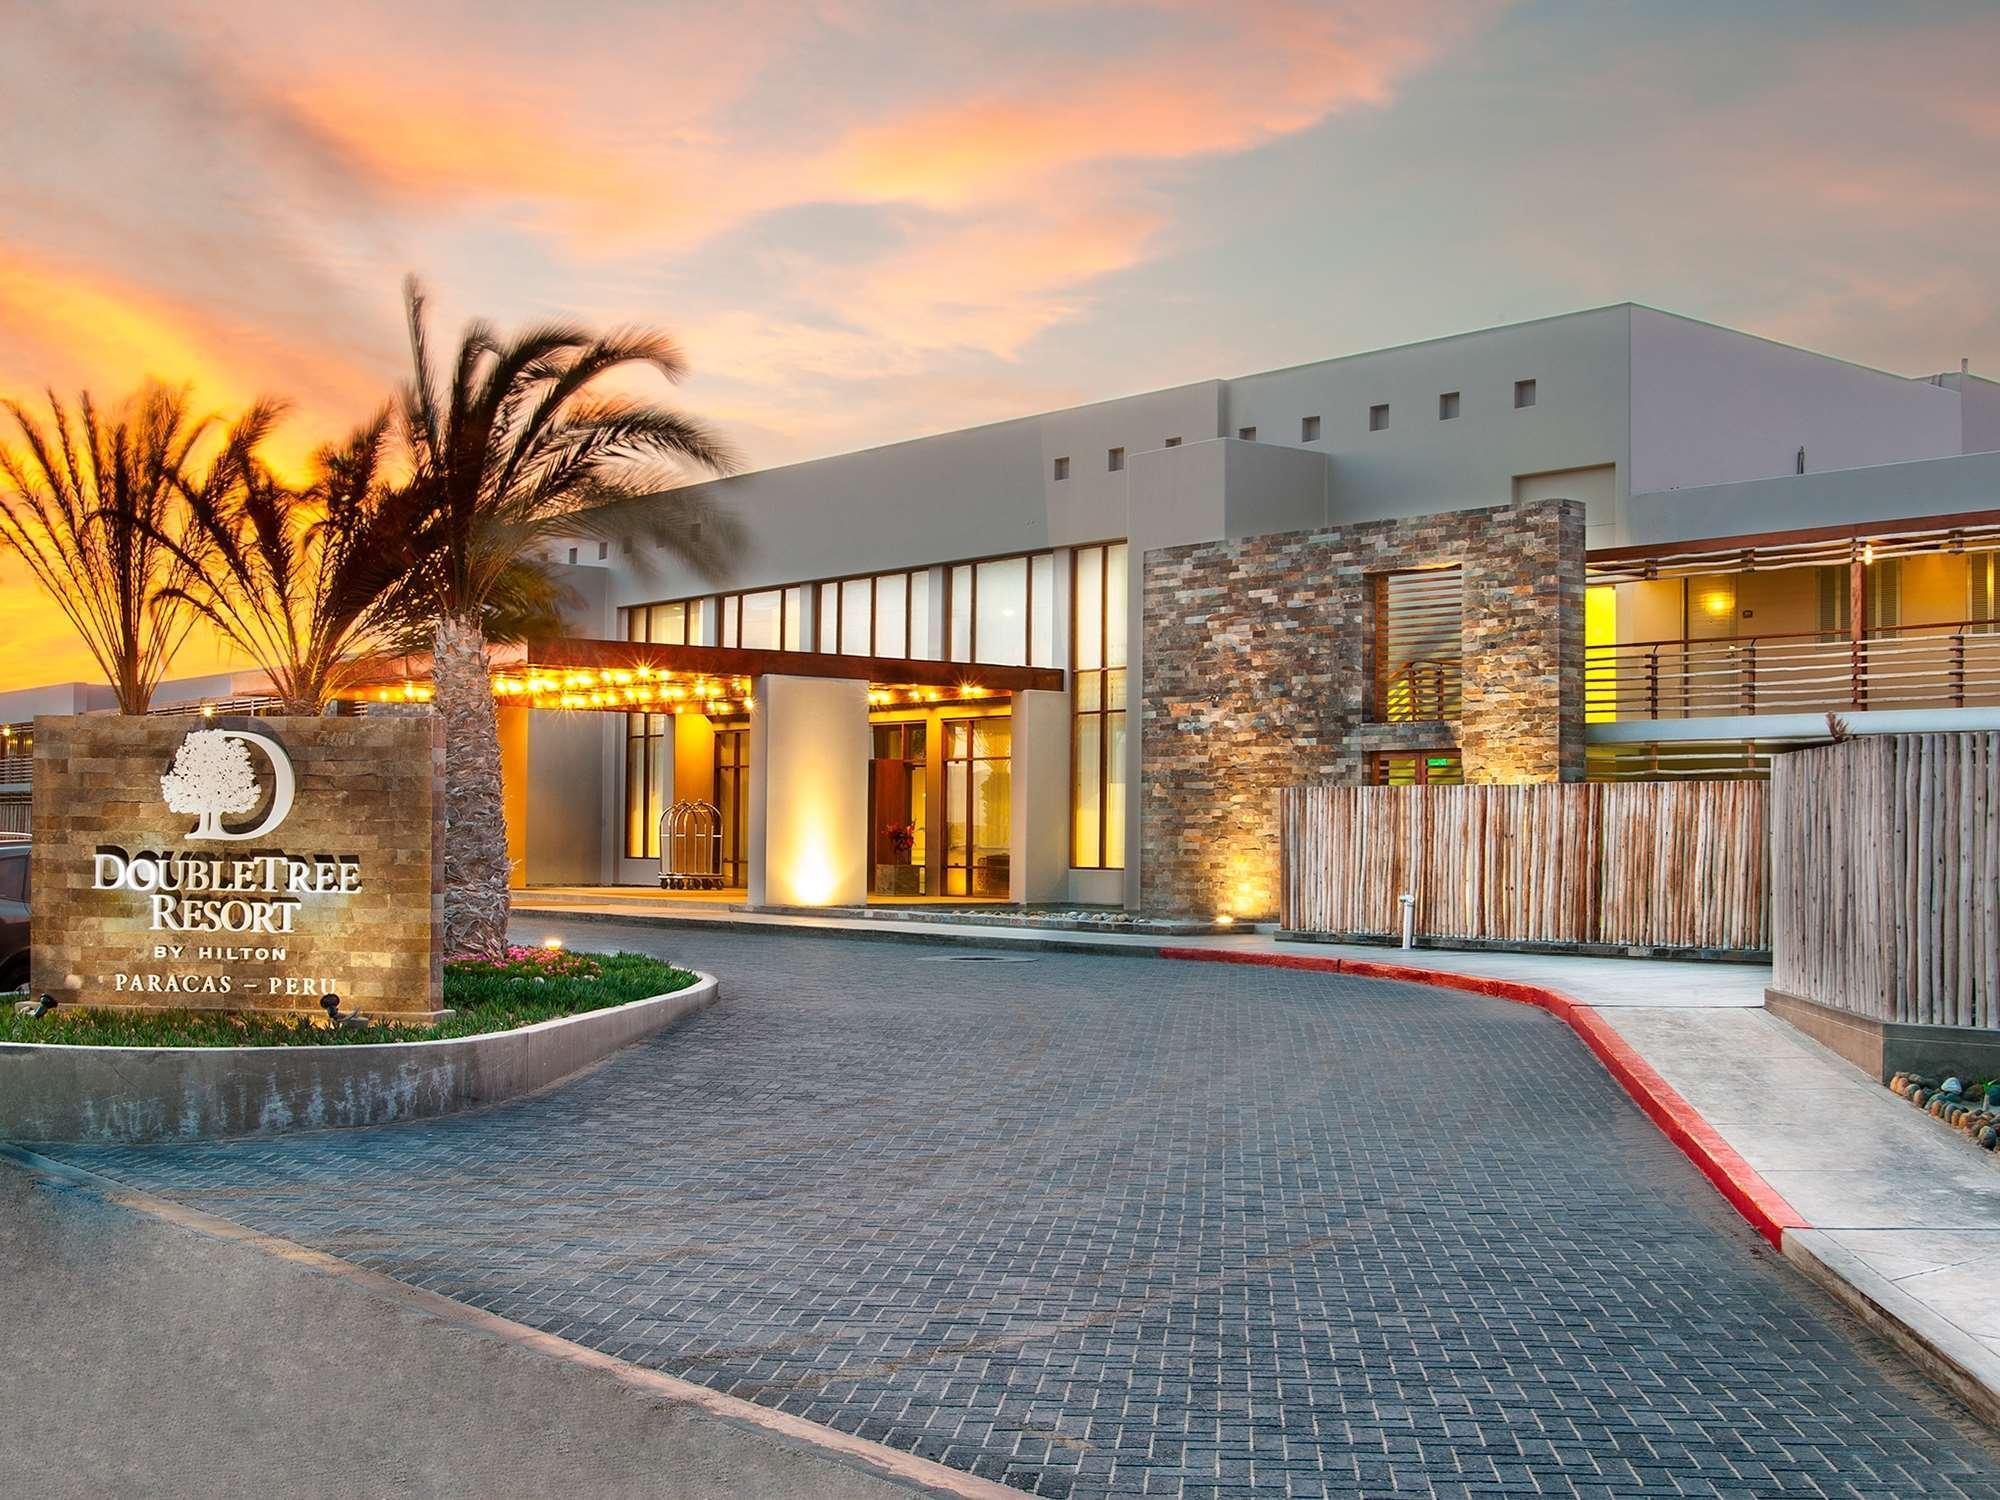 Doubletree By Hilton Resort Peru Paracas, Pisco